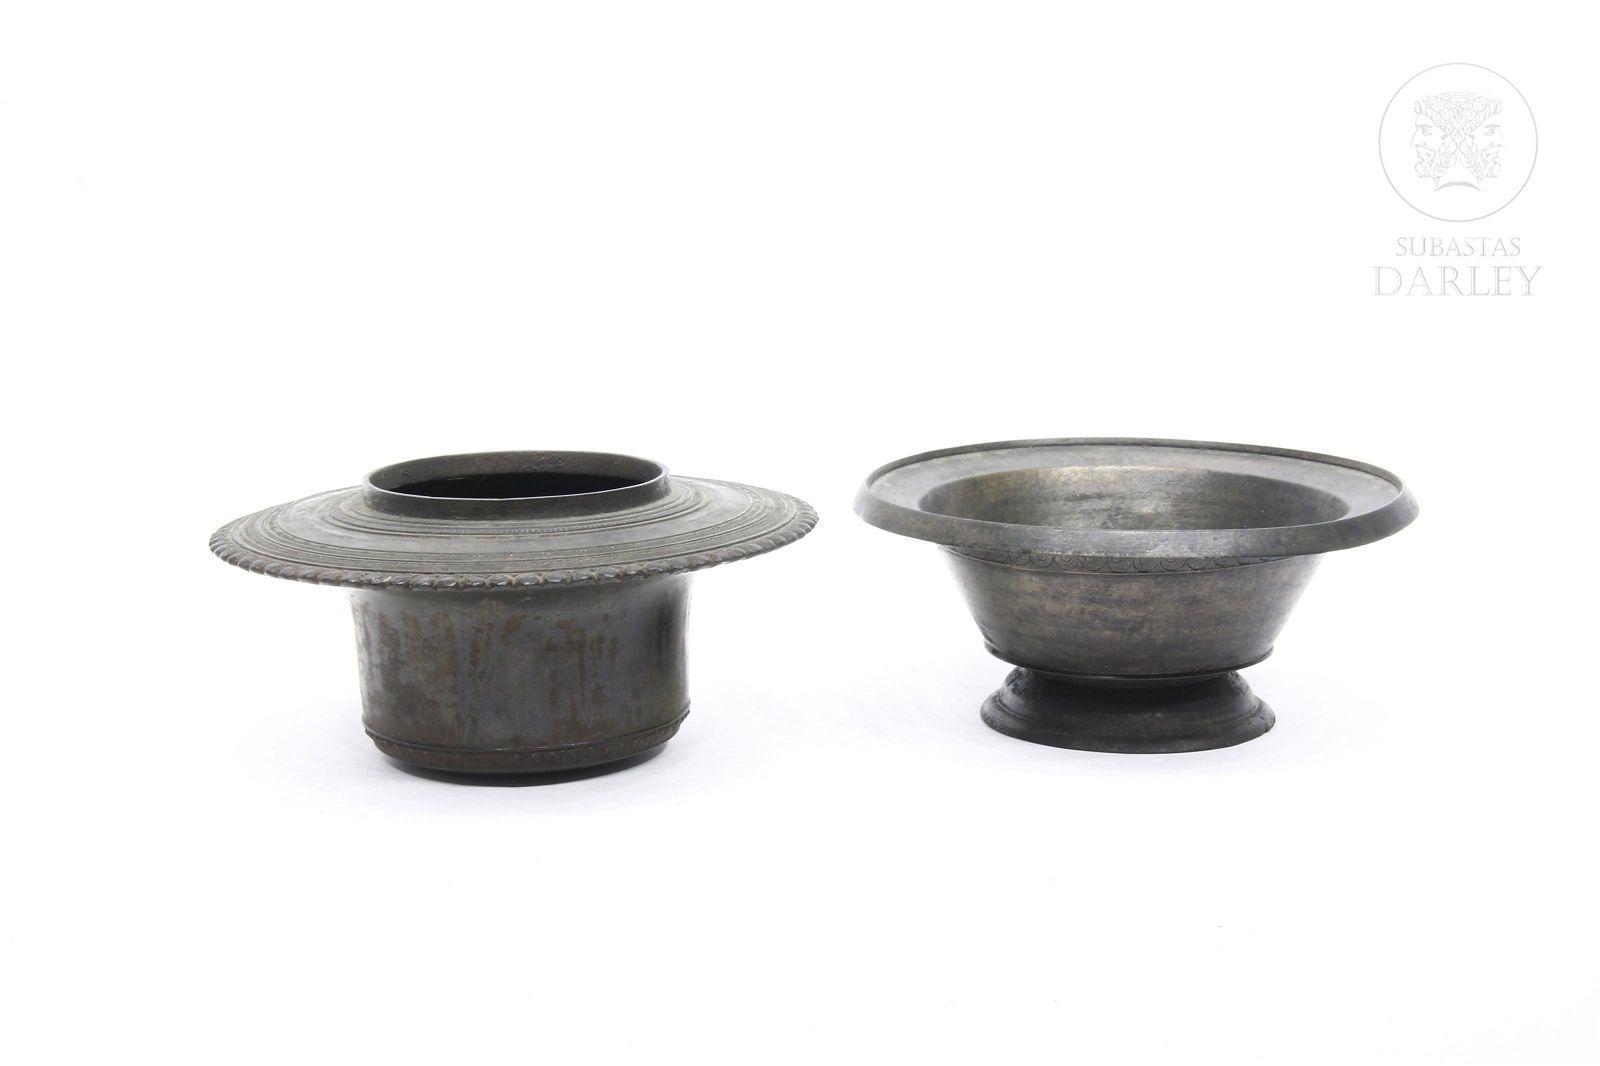 Two flat rim bowls, Indonesia.